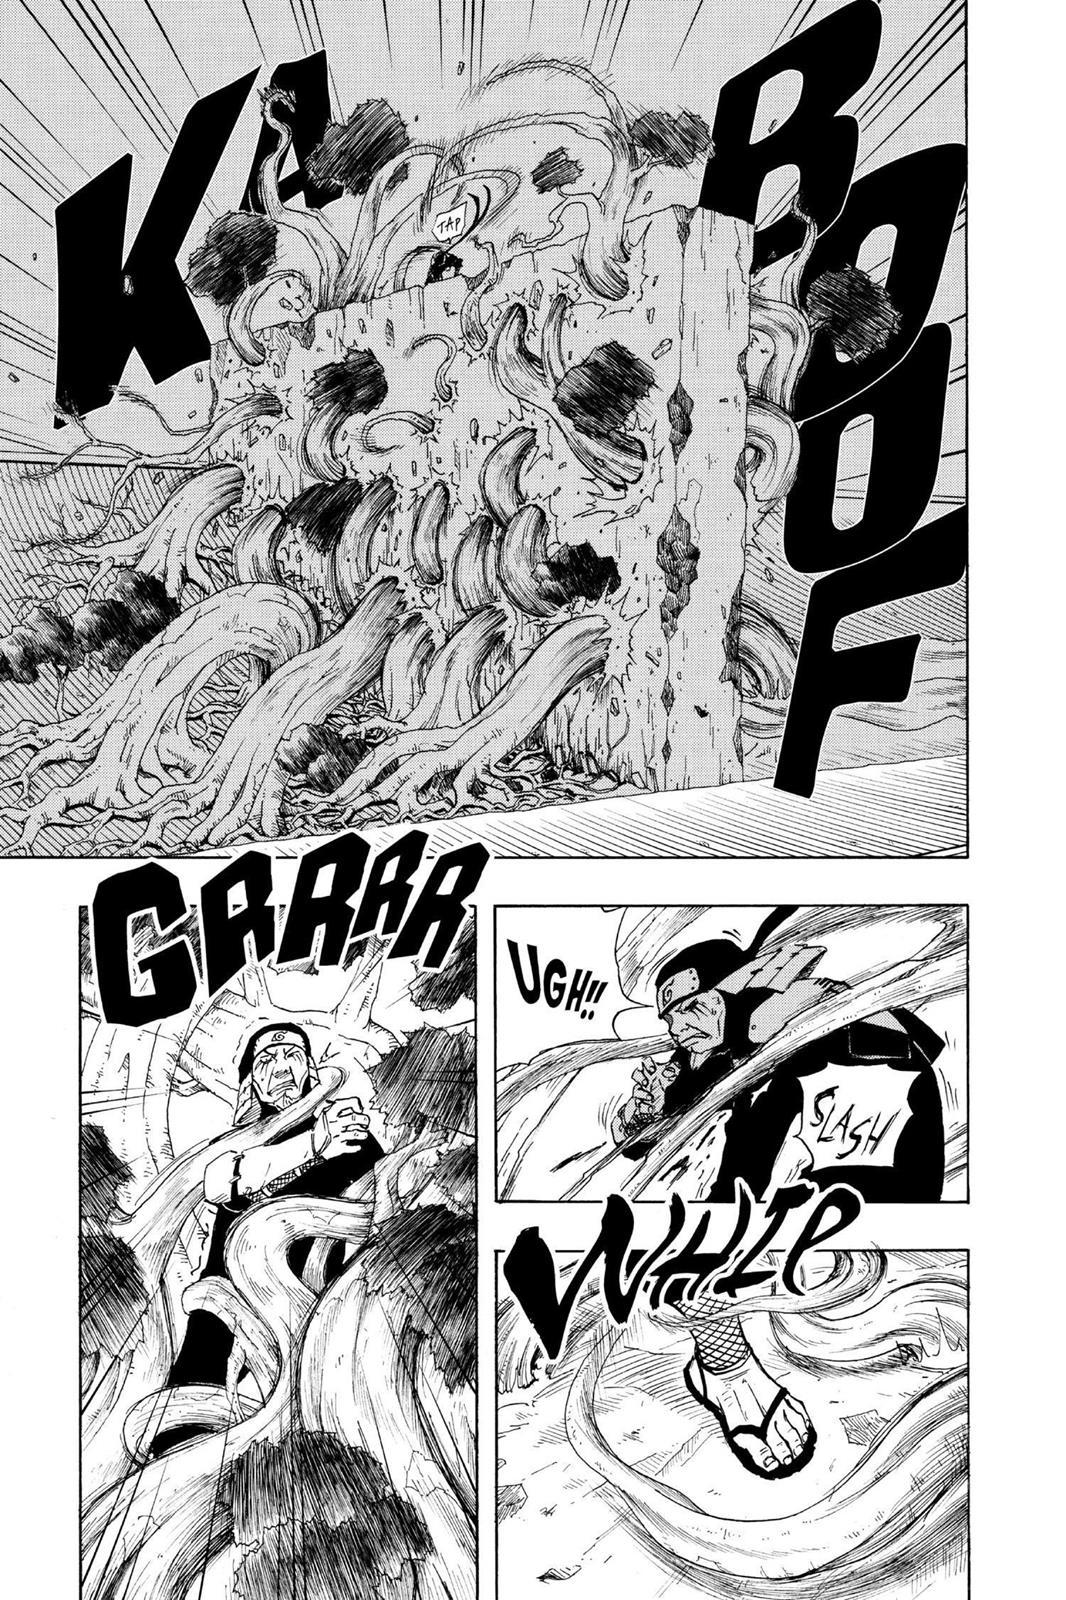 Hiruzen No auge era superior a quase todos da Akatsuki ?? - Página 2 0120-007